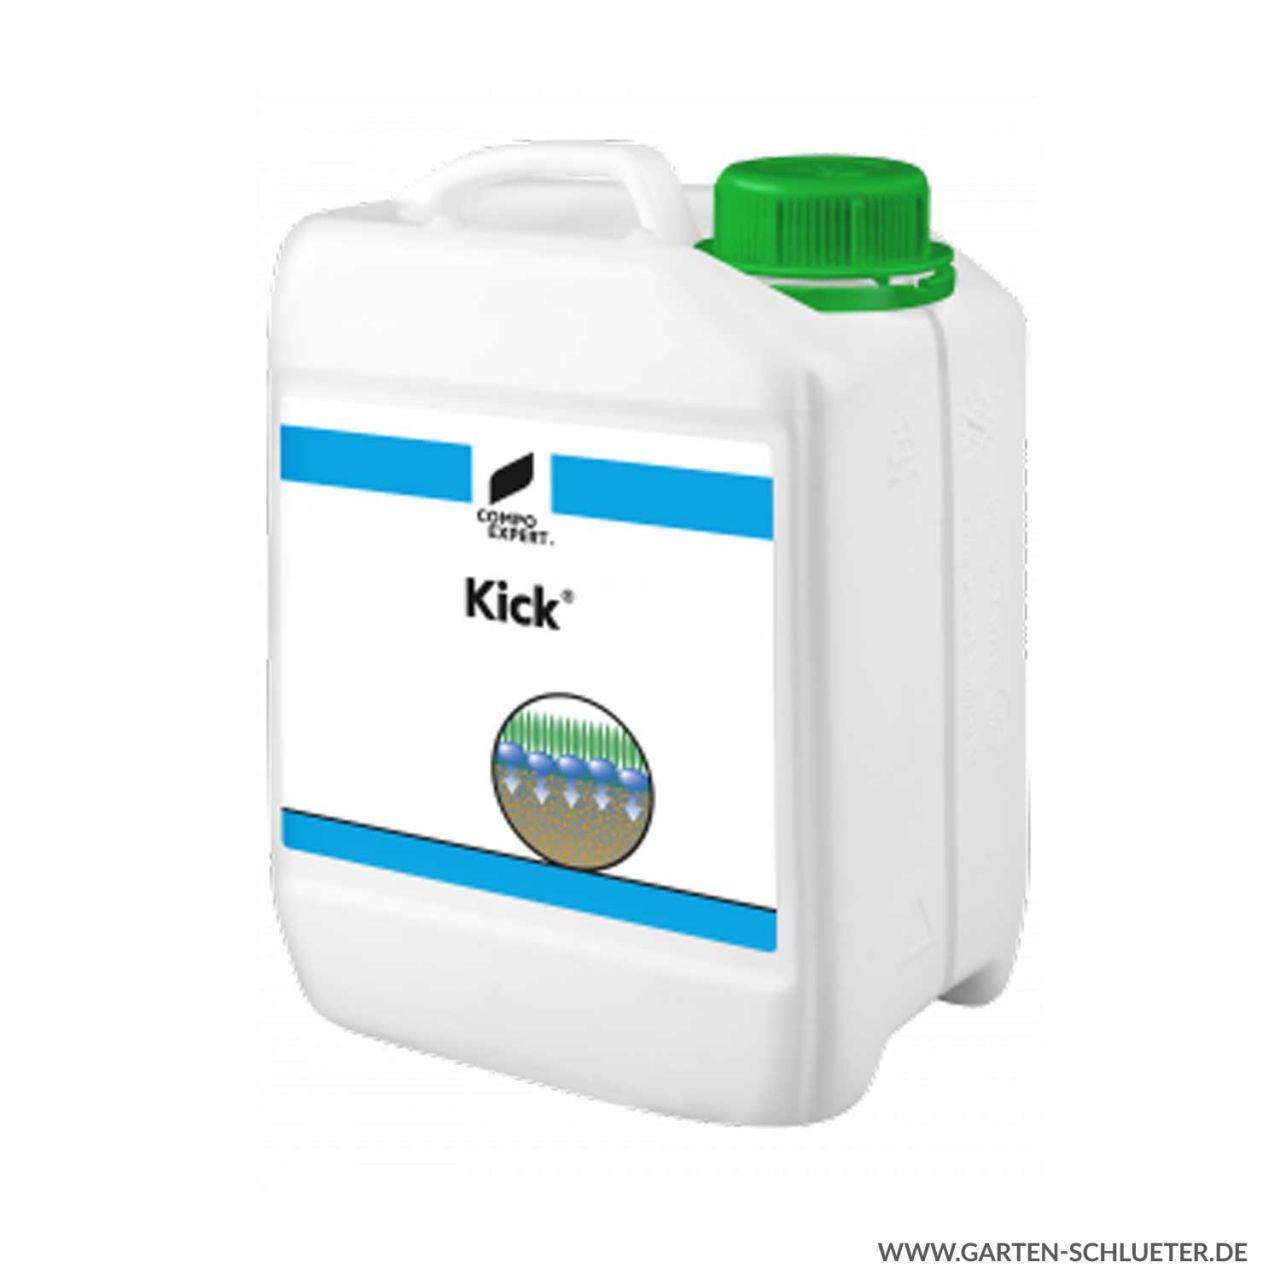 Bodenverbesserer & Wetting Agents - Compo Expert® Kick® - 2,5 Liter